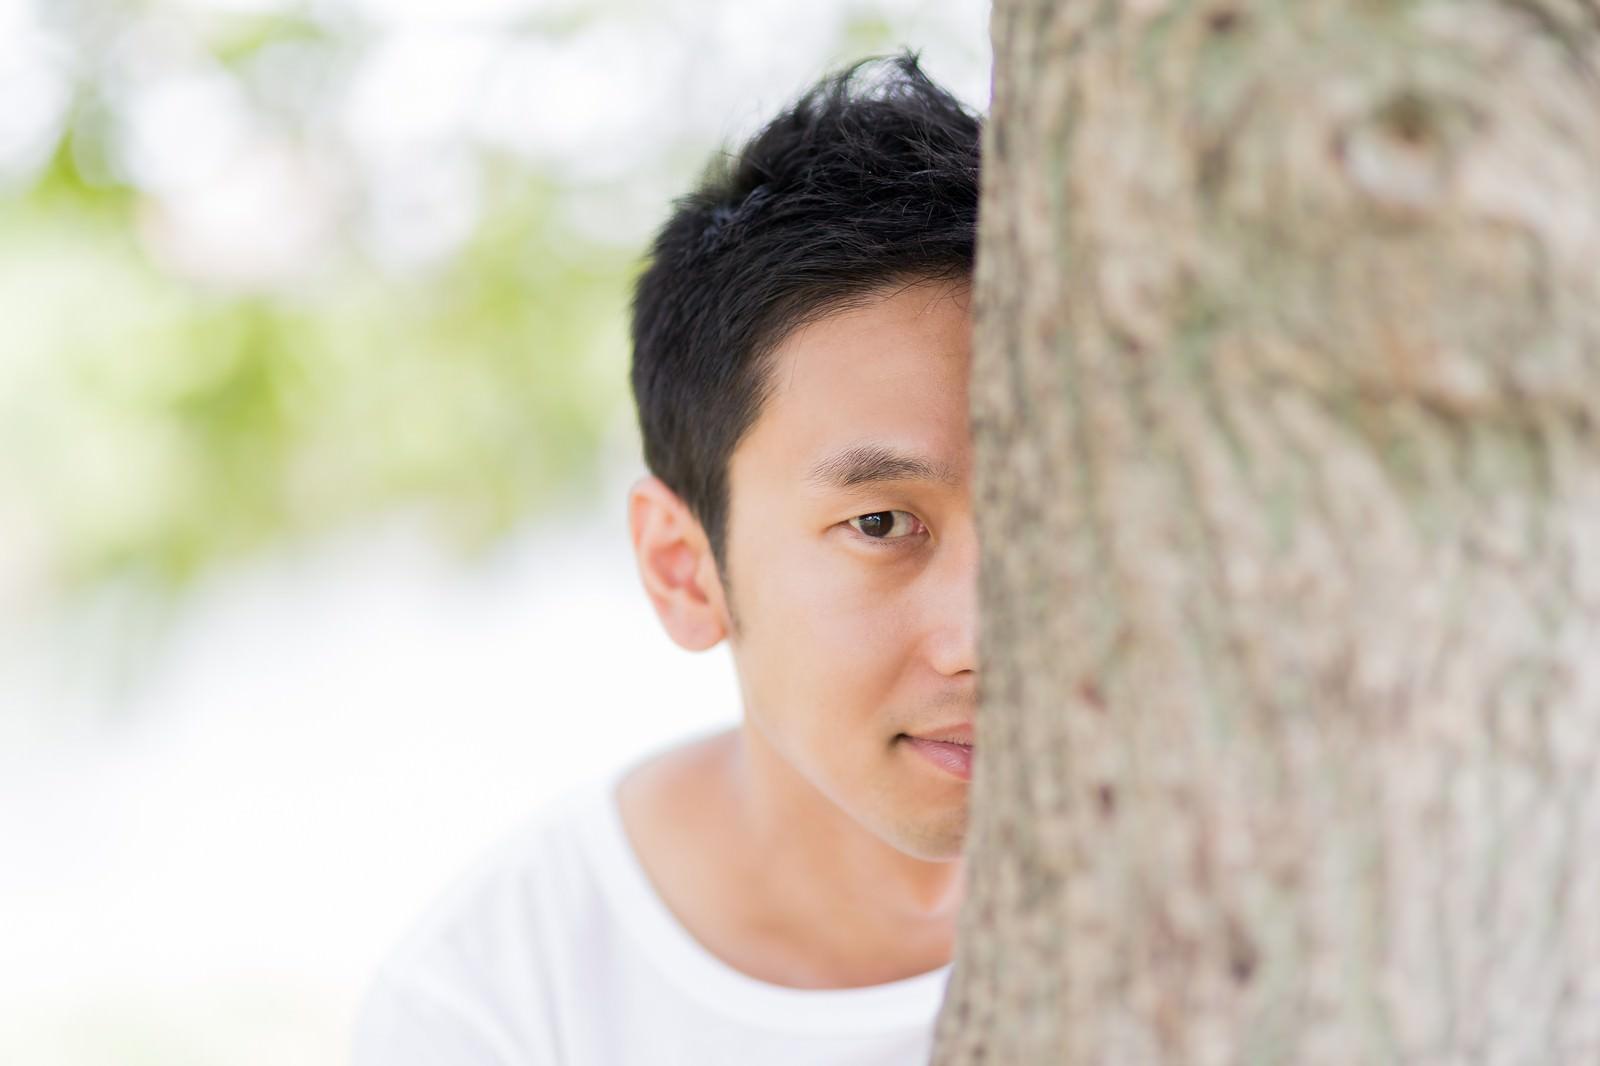 https://www.pakutaso.com/shared/img/thumb/PAK25_ookawakakurenbo_TP_V.jpg